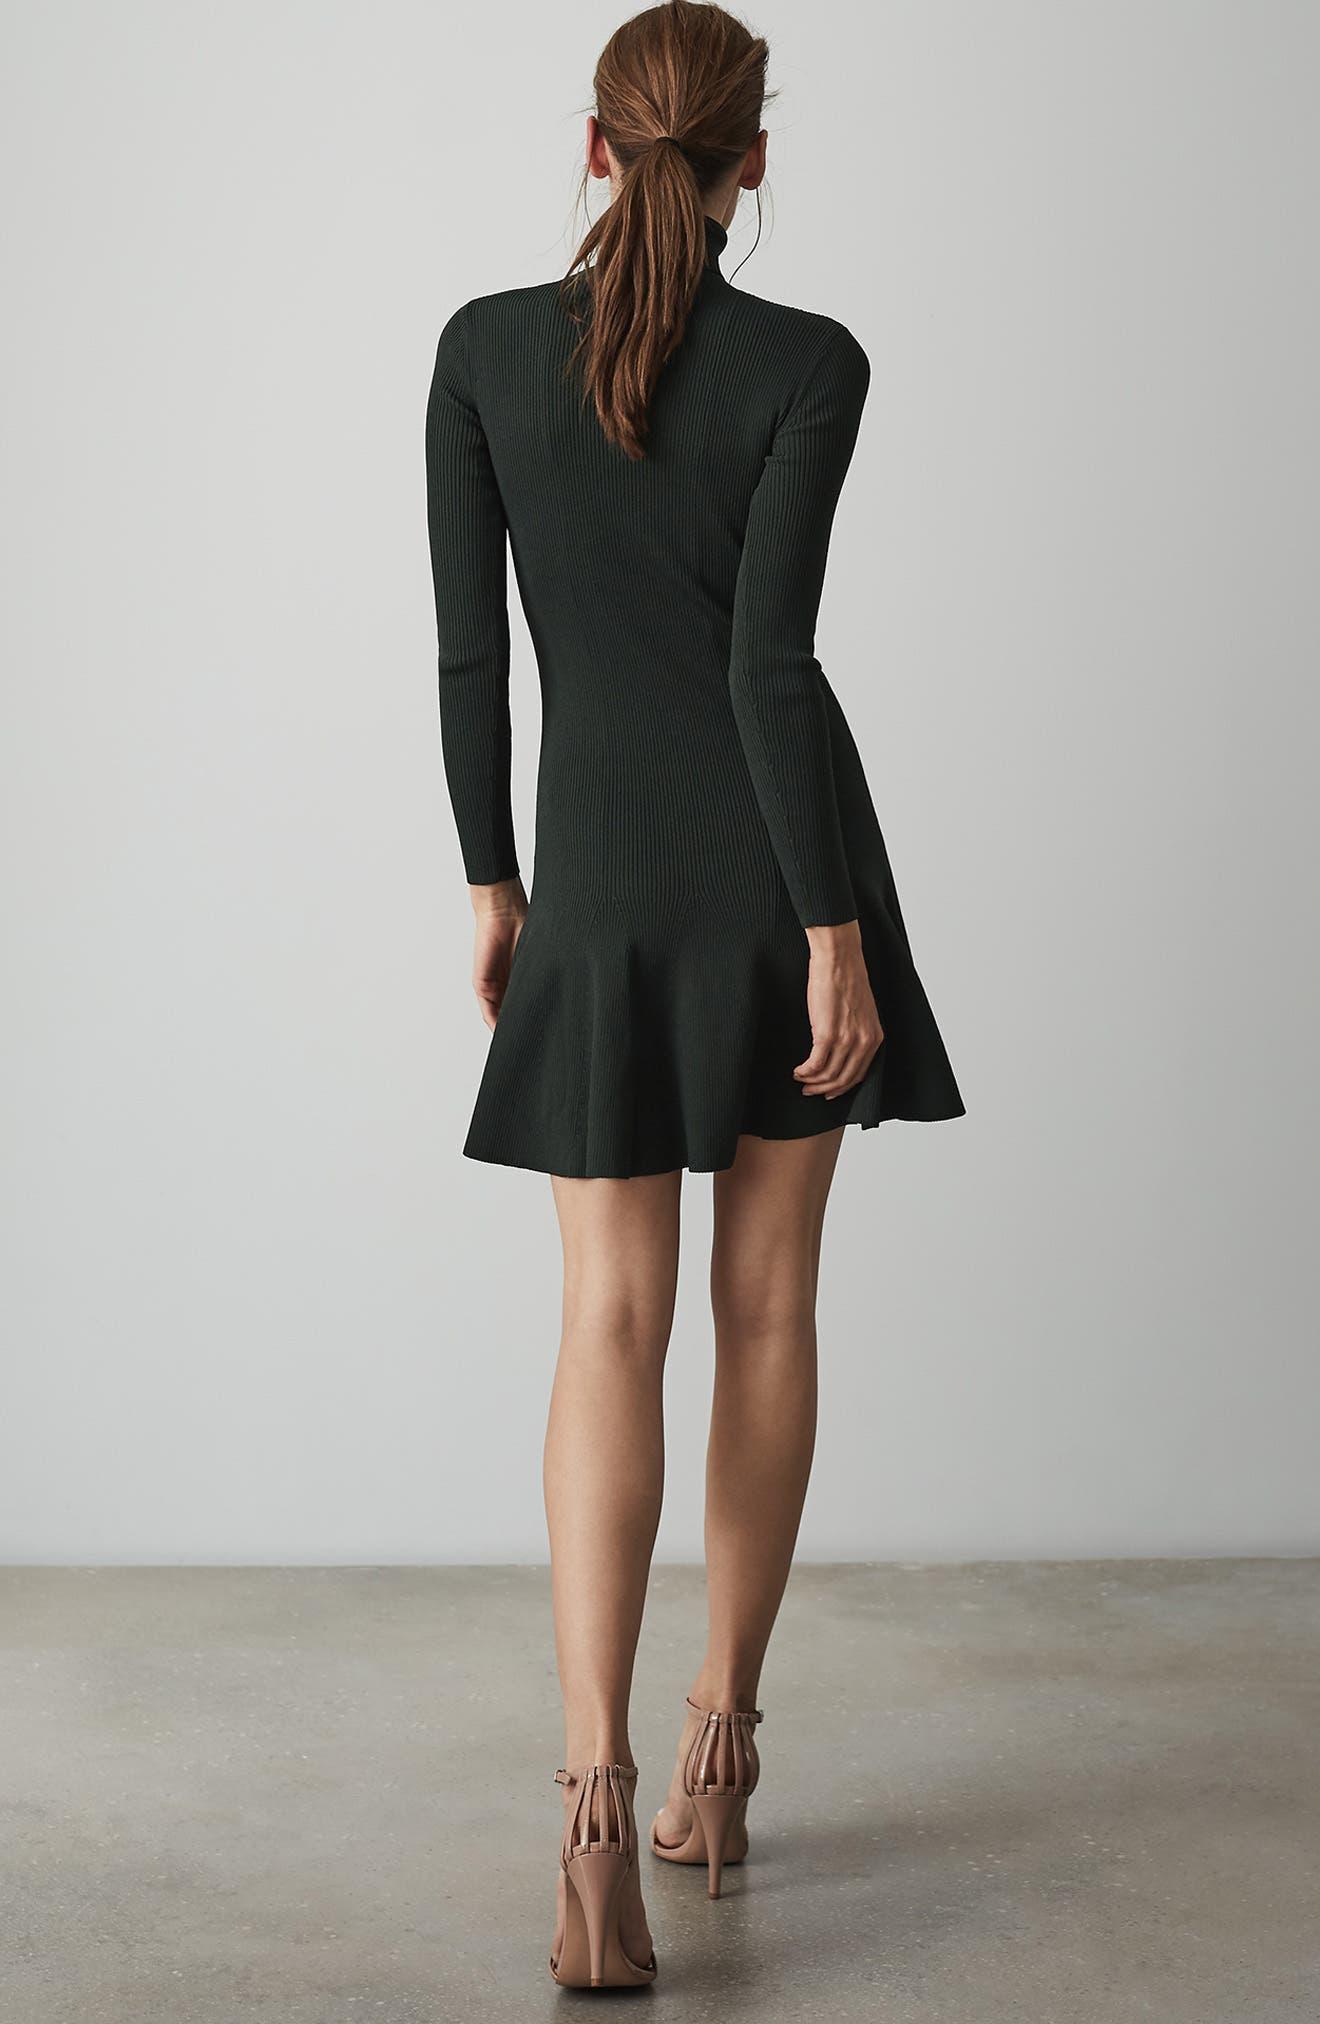 REISS,                             Mimi Turtleneck Sweater Dress,                             Alternate thumbnail 8, color,                             GREEN